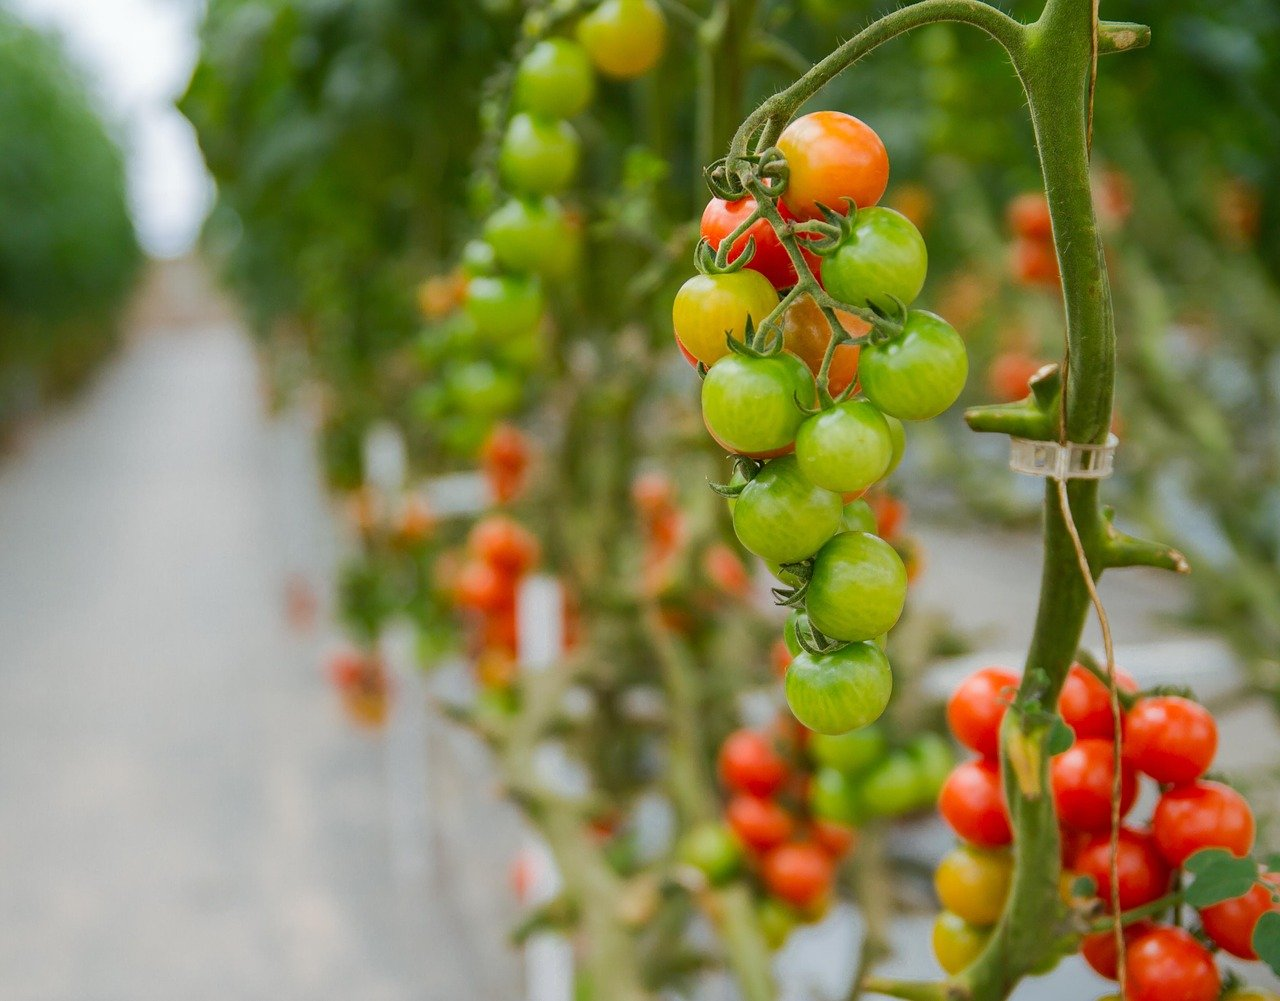 hydroponic tomatoes 2